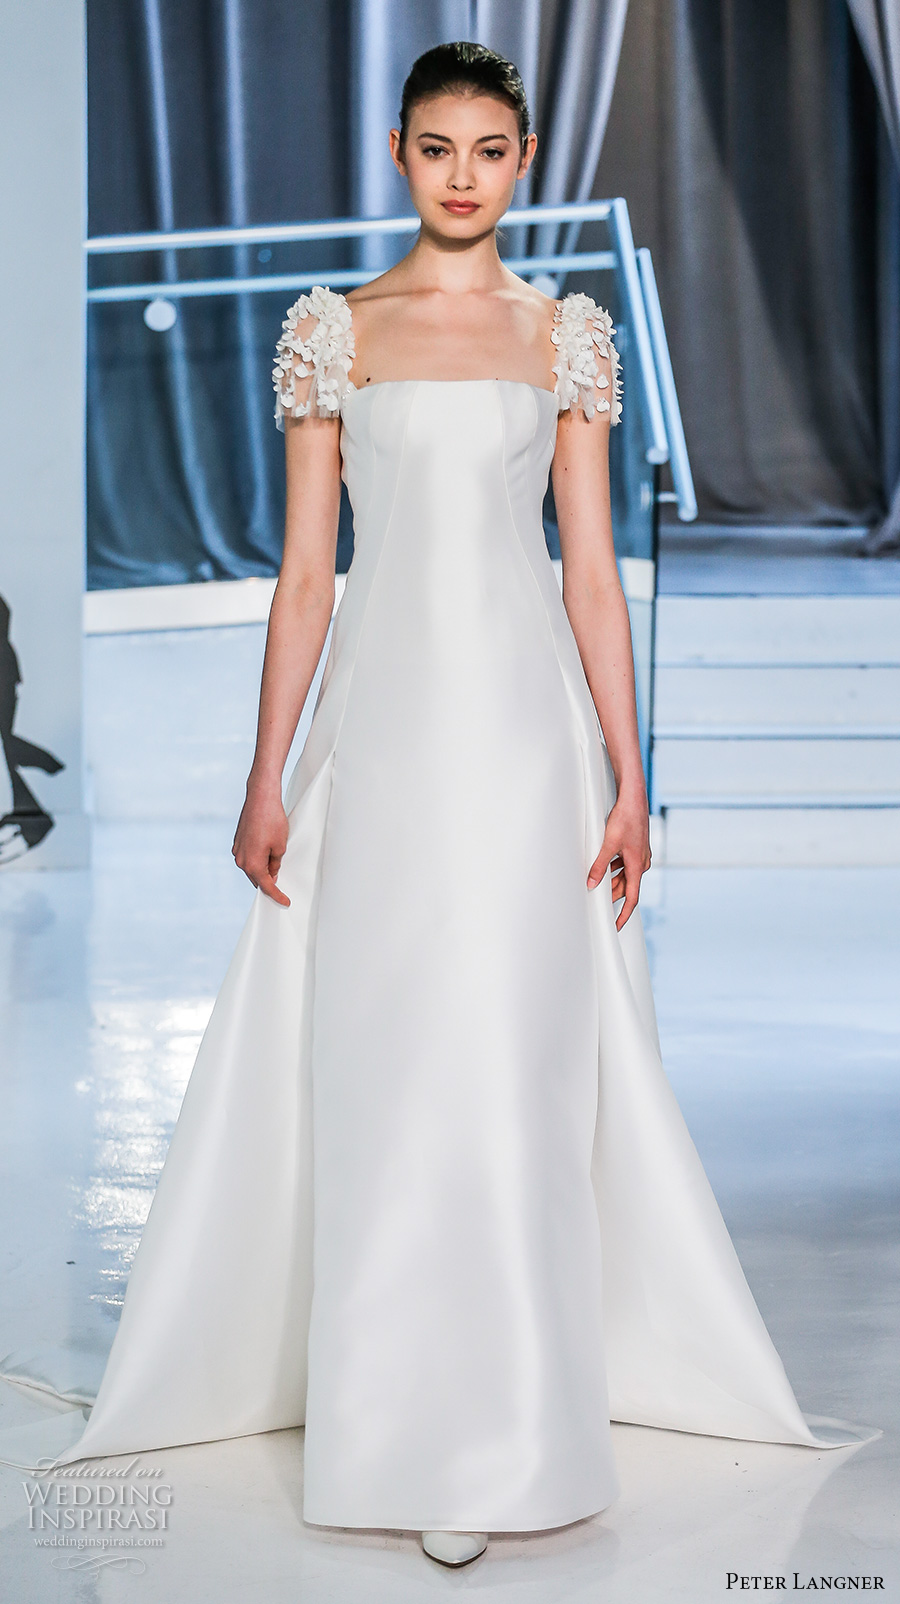 peter-langner-spring-2018-bridal-puff-sleeves-straight-across-neckline-simple-clean-elegant-sheath-wedding-dress-open-v-back-chapel-train-15-mv.jpg